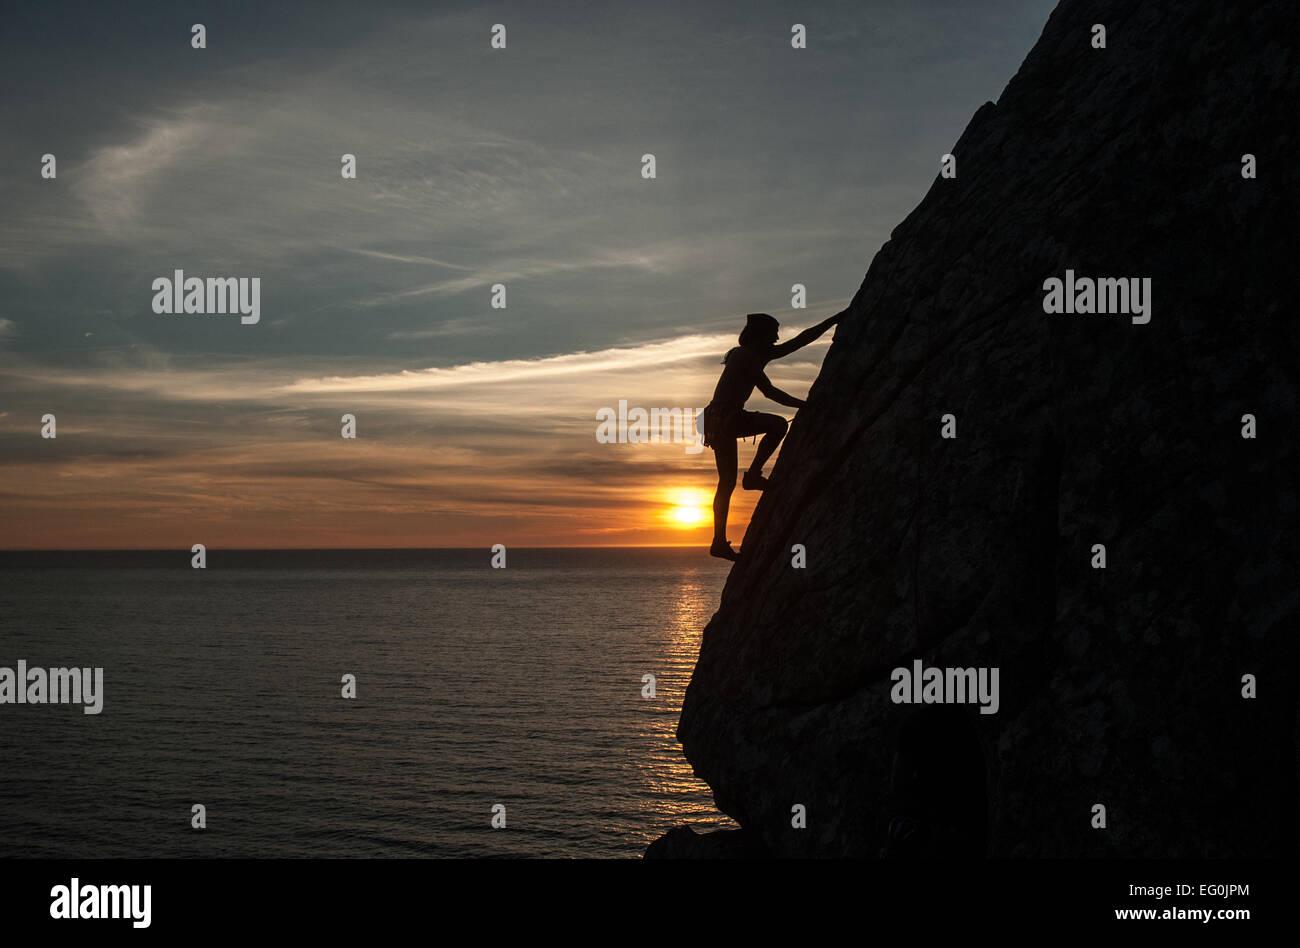 Silhouette der Frau Klettern Klippe bei Sonnenuntergang, Galicien, Spanien Stockbild